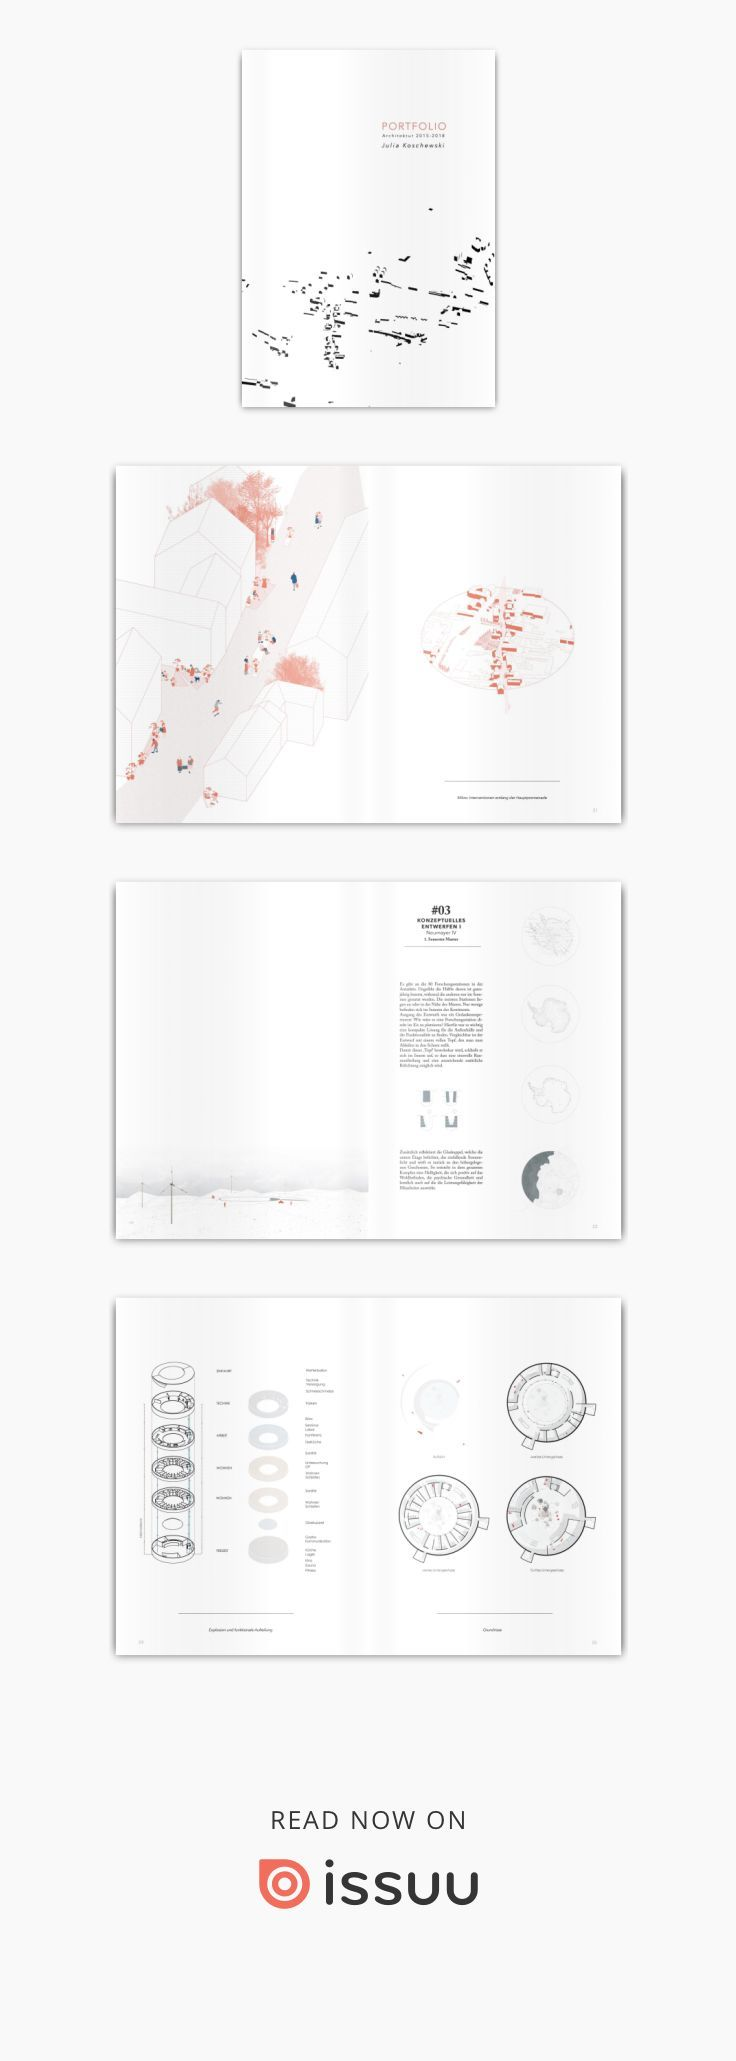 architecture portfolio 2019 by julia koschewski